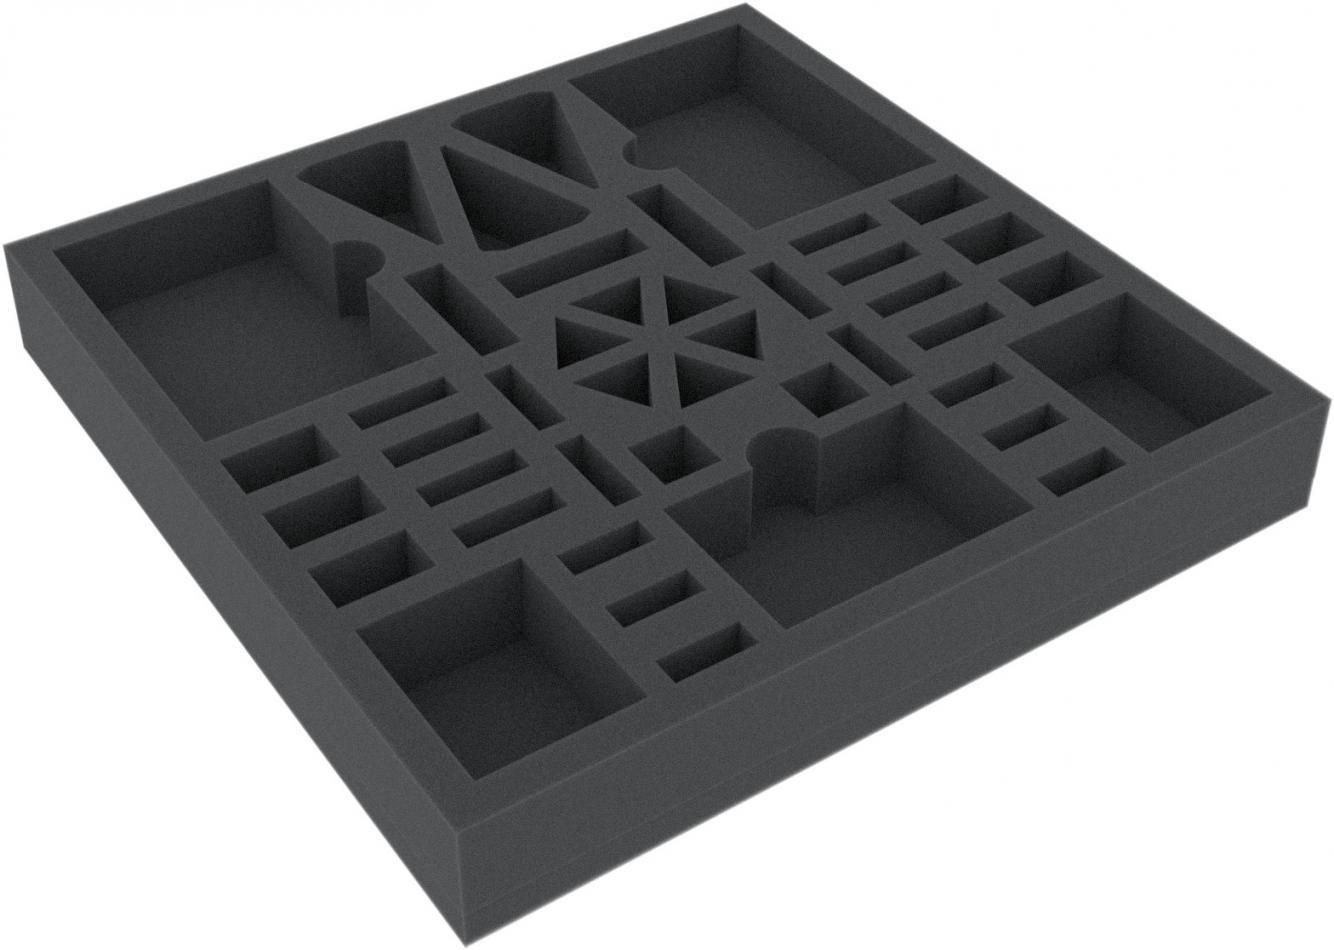 AFKV035BO 35 mm foam tray for Star Wars Rebellion: Rise of the Empire